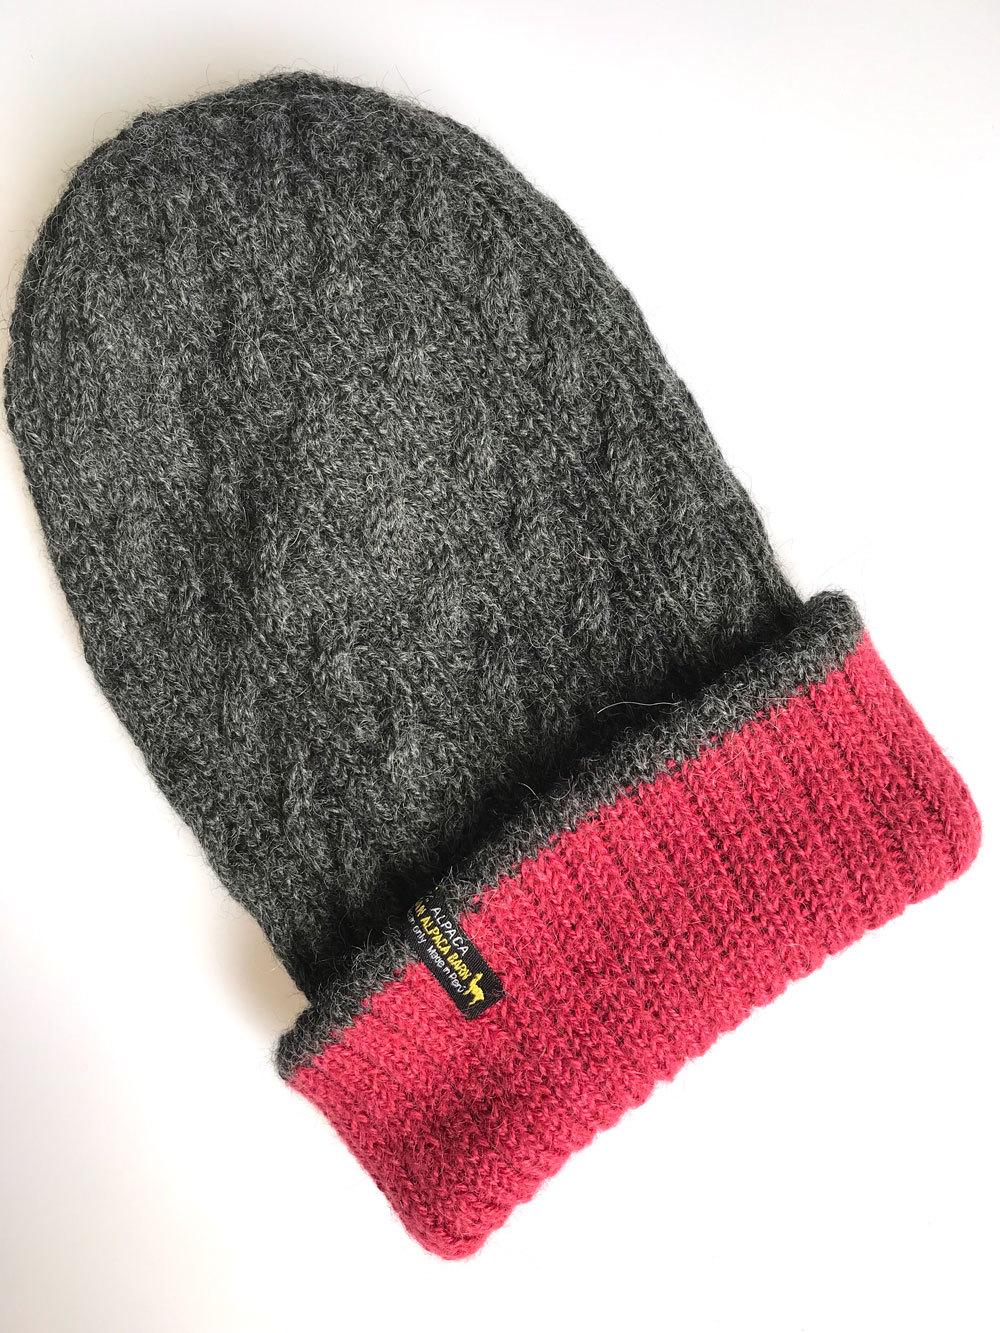 43f0ffe2b07 Reversible Hand Knit Alpaca Beanie - Charcoal Raspberry